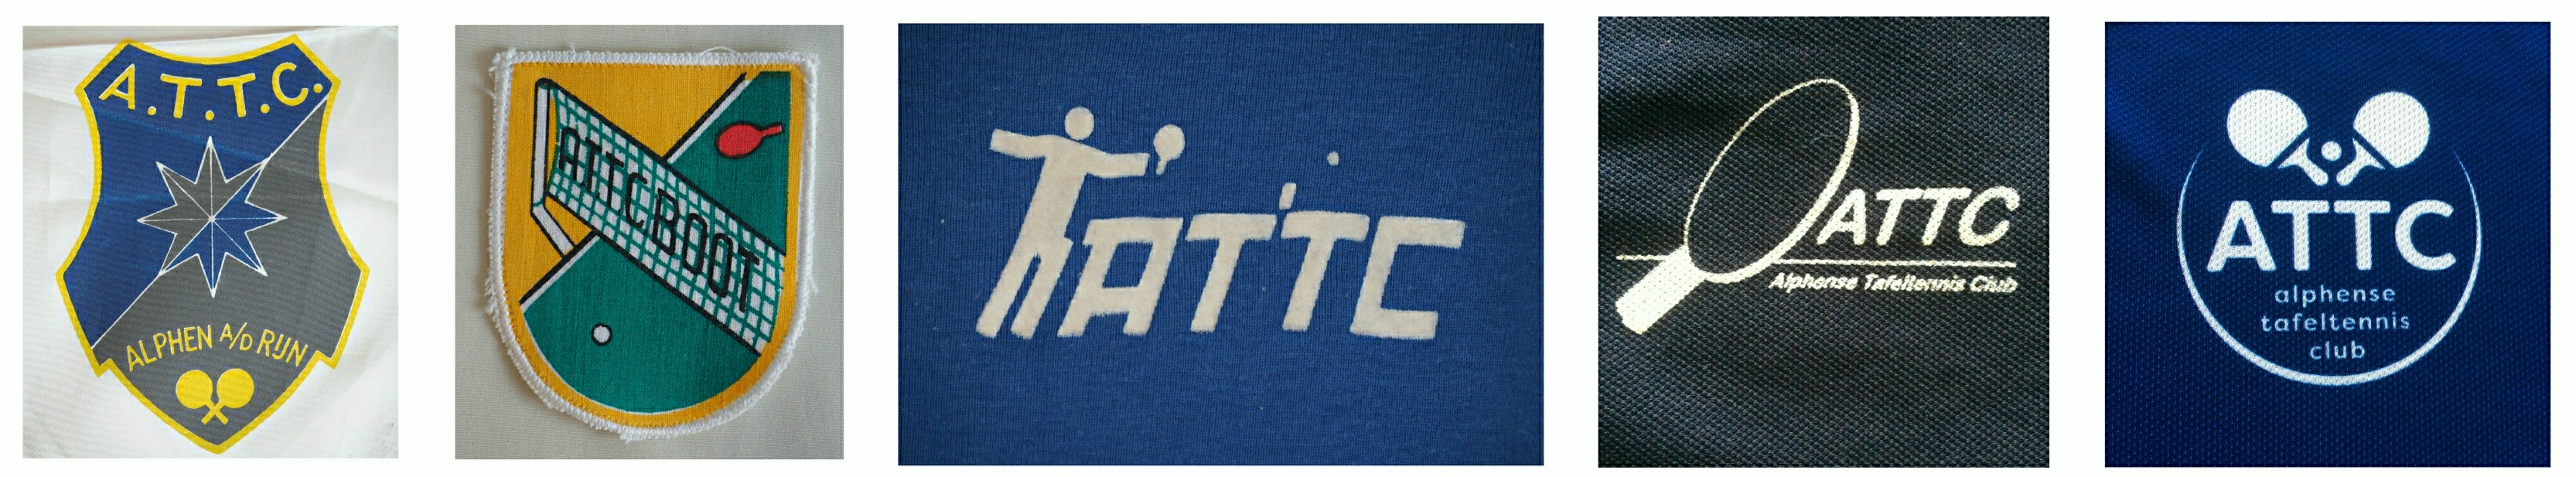 Shirtlogo's ATTC